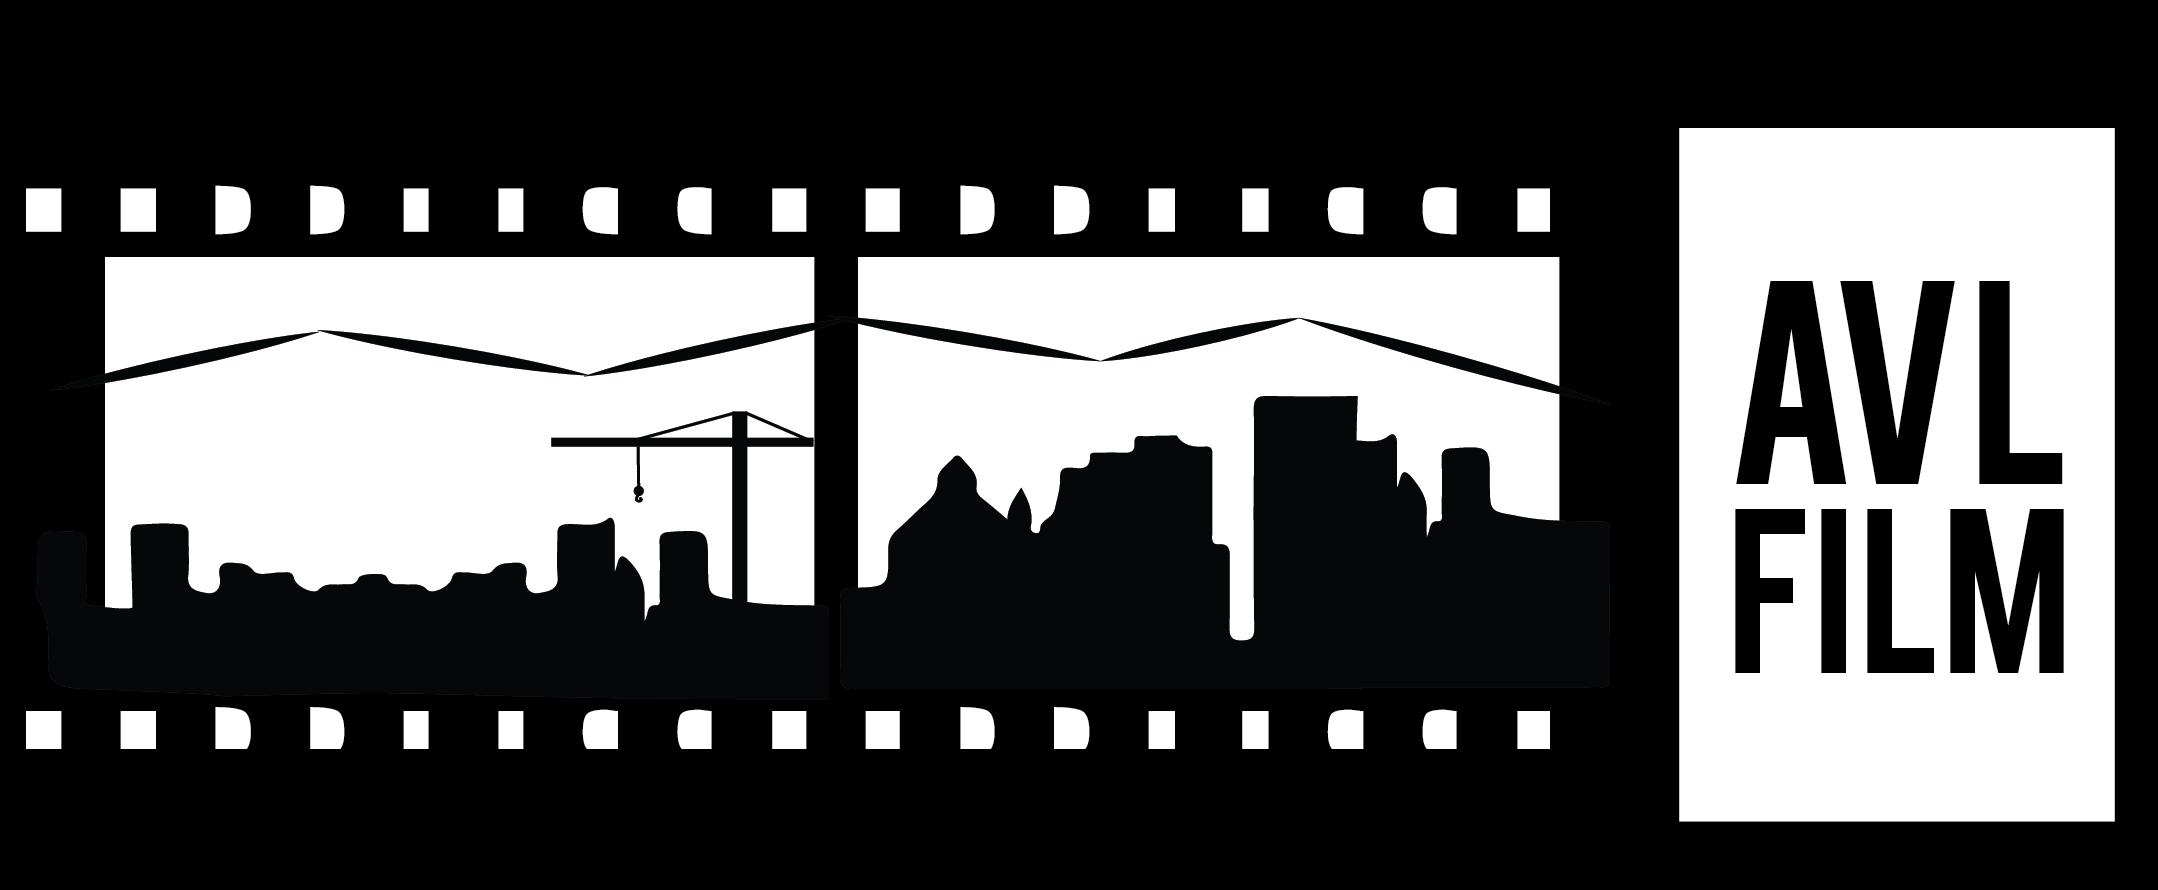 Film clipart film study. Asheville